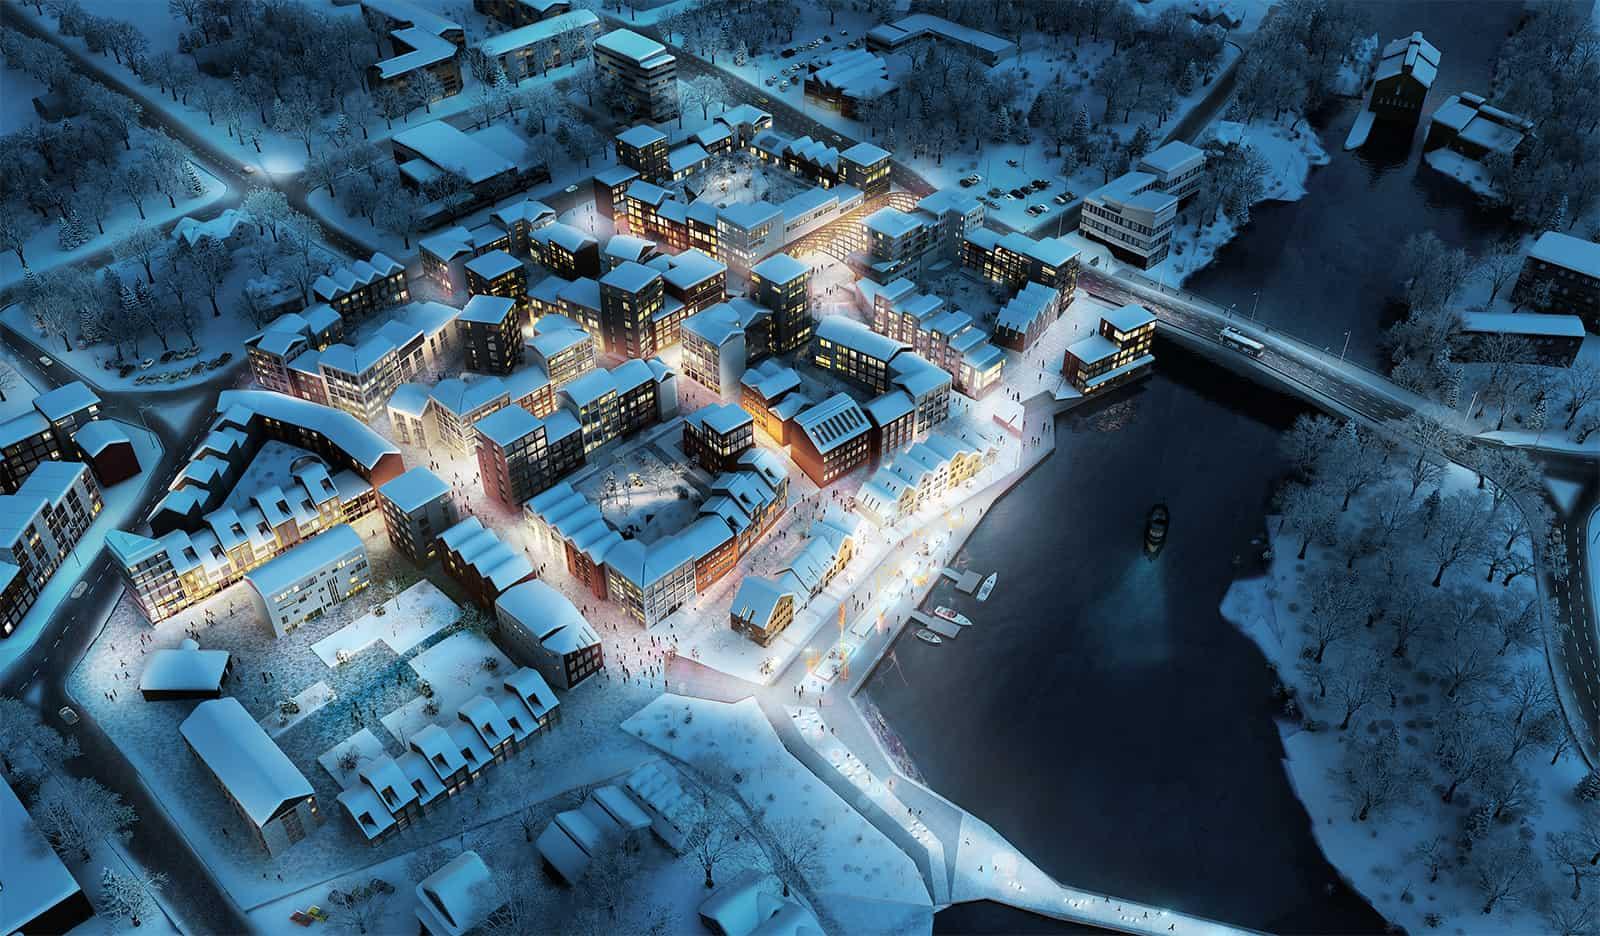 Finland • Housing • Mixed use • Bird Eye • Winter